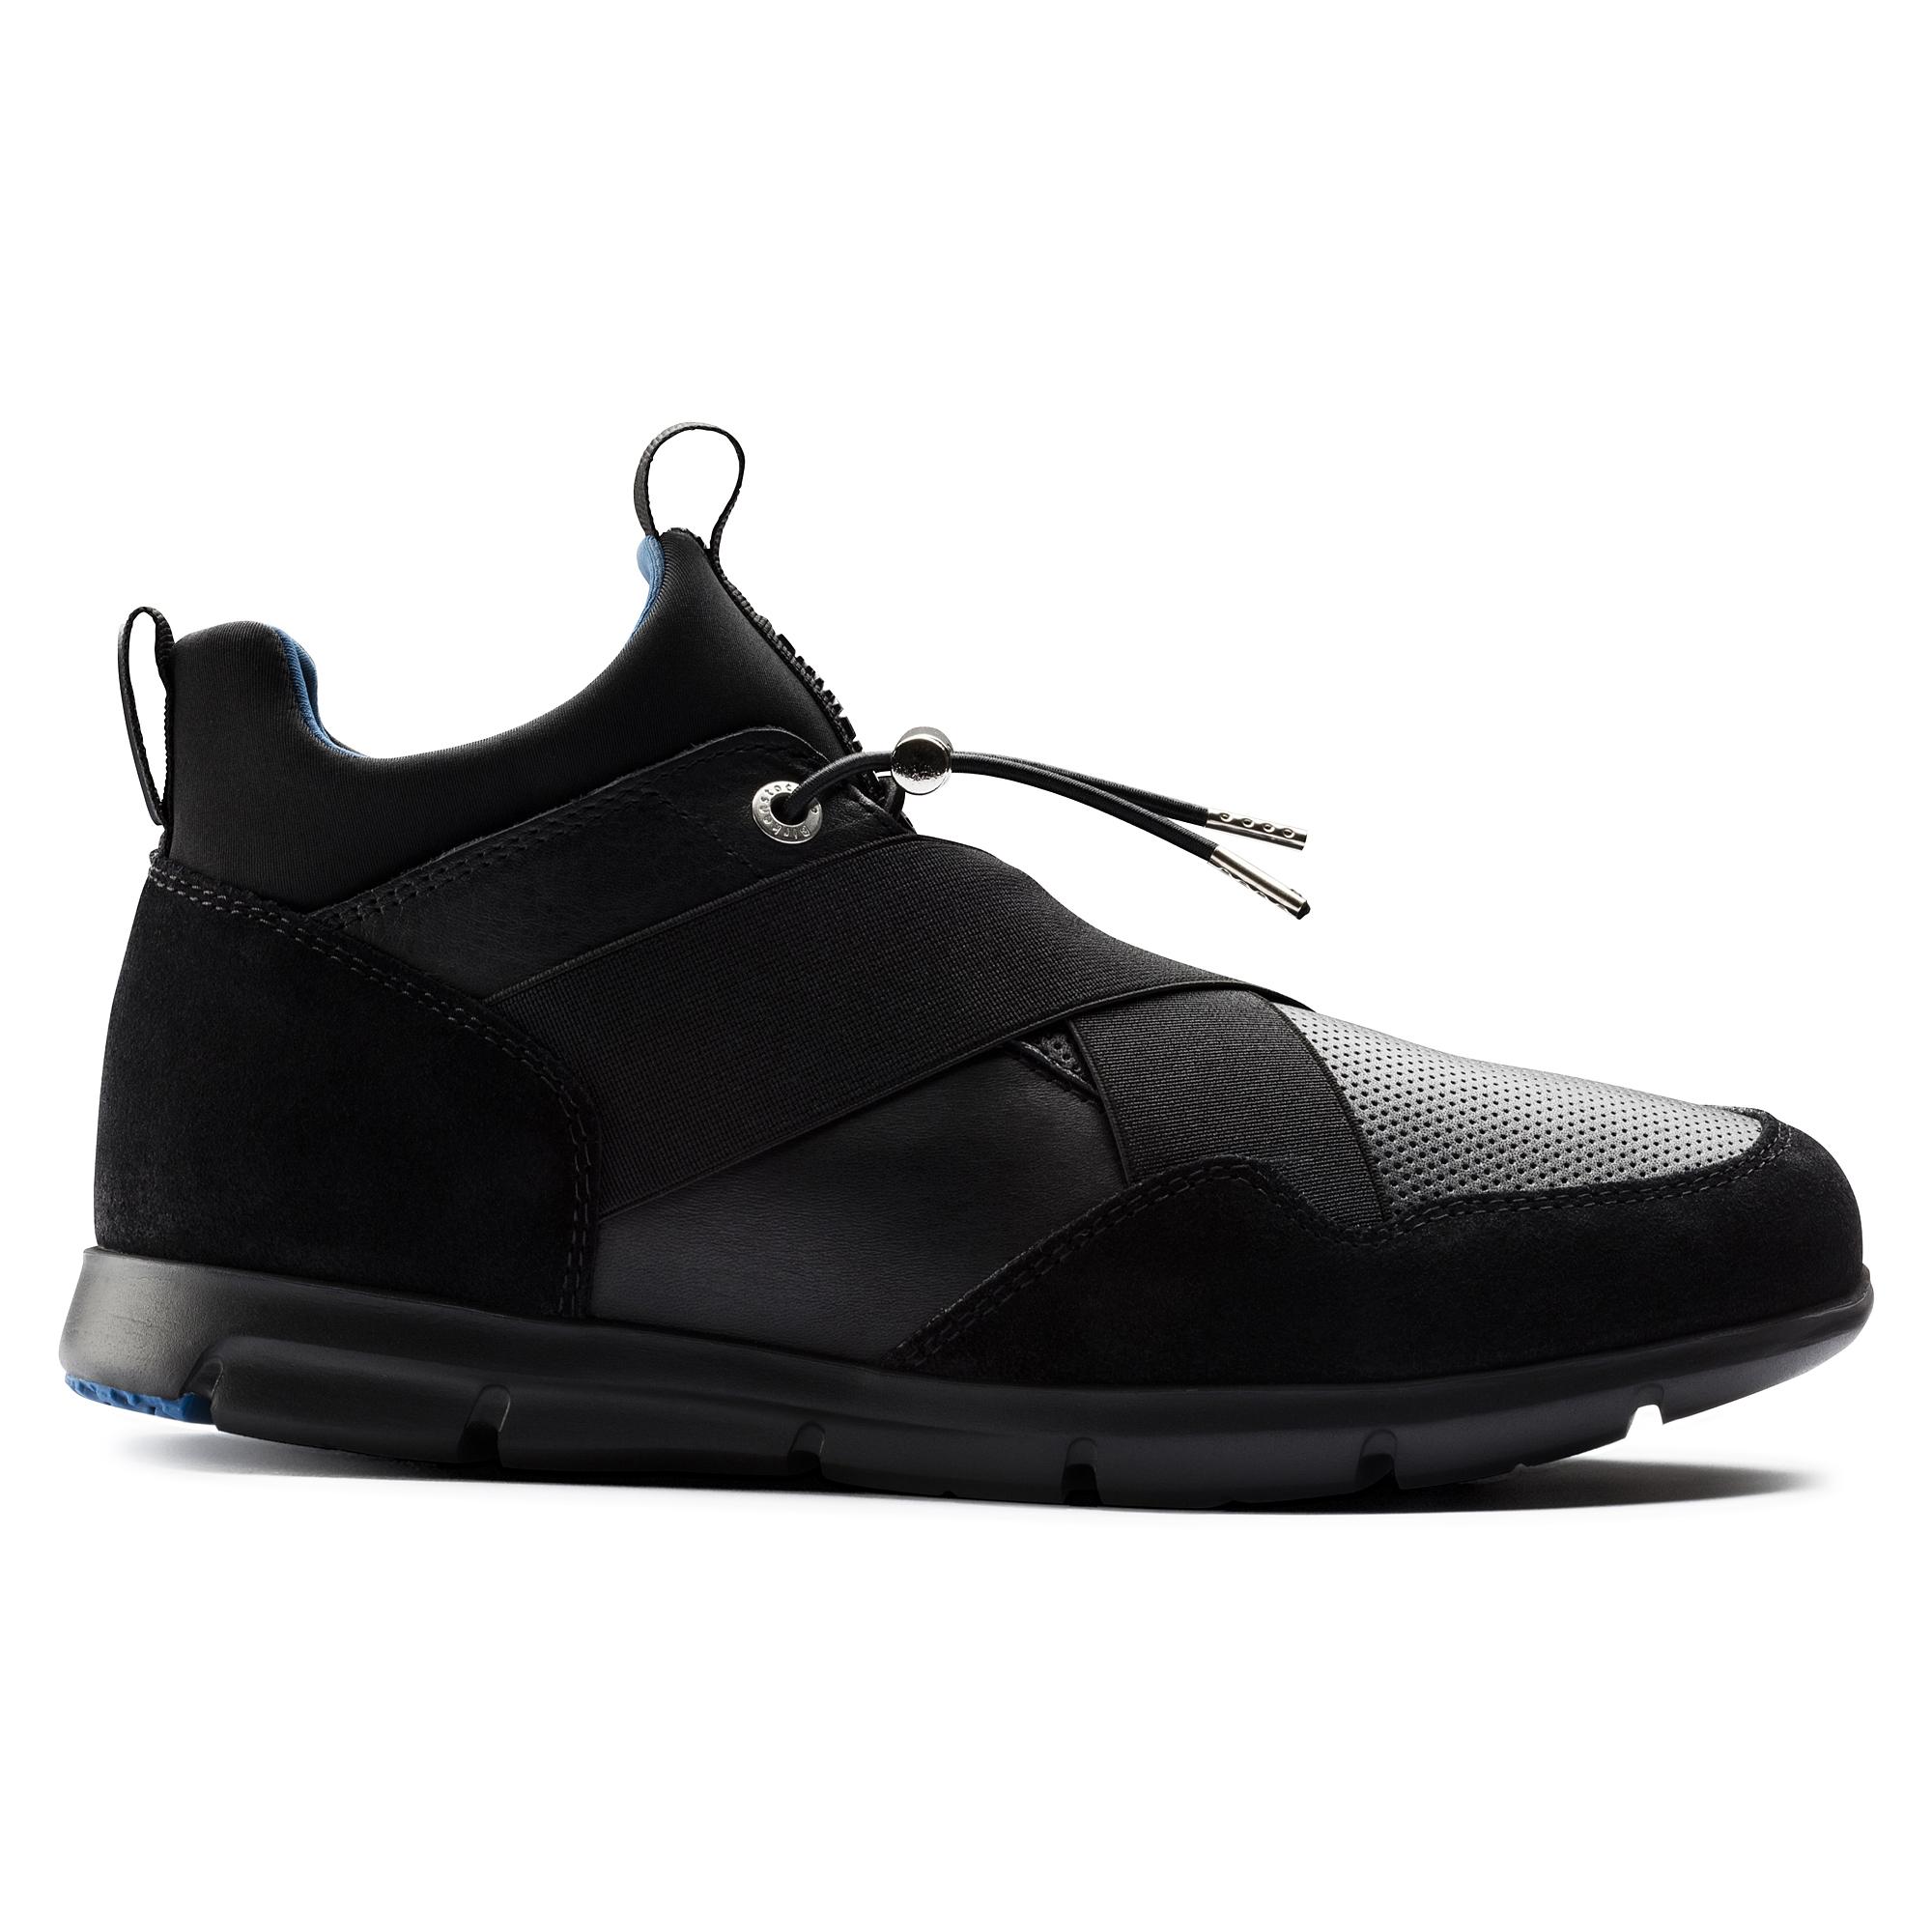 Birkenstock Ames Women Lealther Shoes